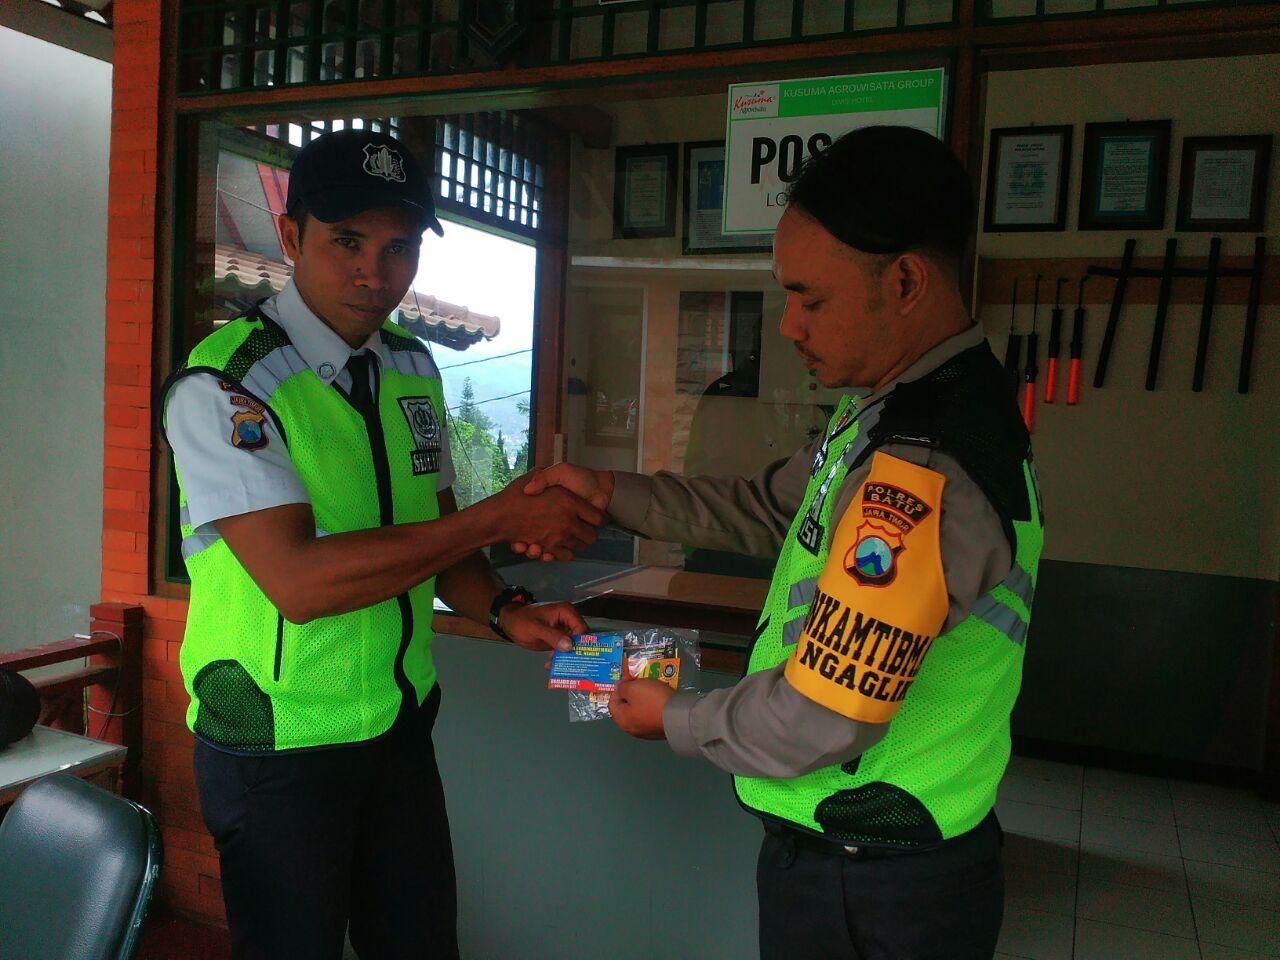 Anggota Binmas Polsek Batu Polres Batu Laksanakan Sambang ke Pam Swakarsa Berikan Pesan Kamtibmas